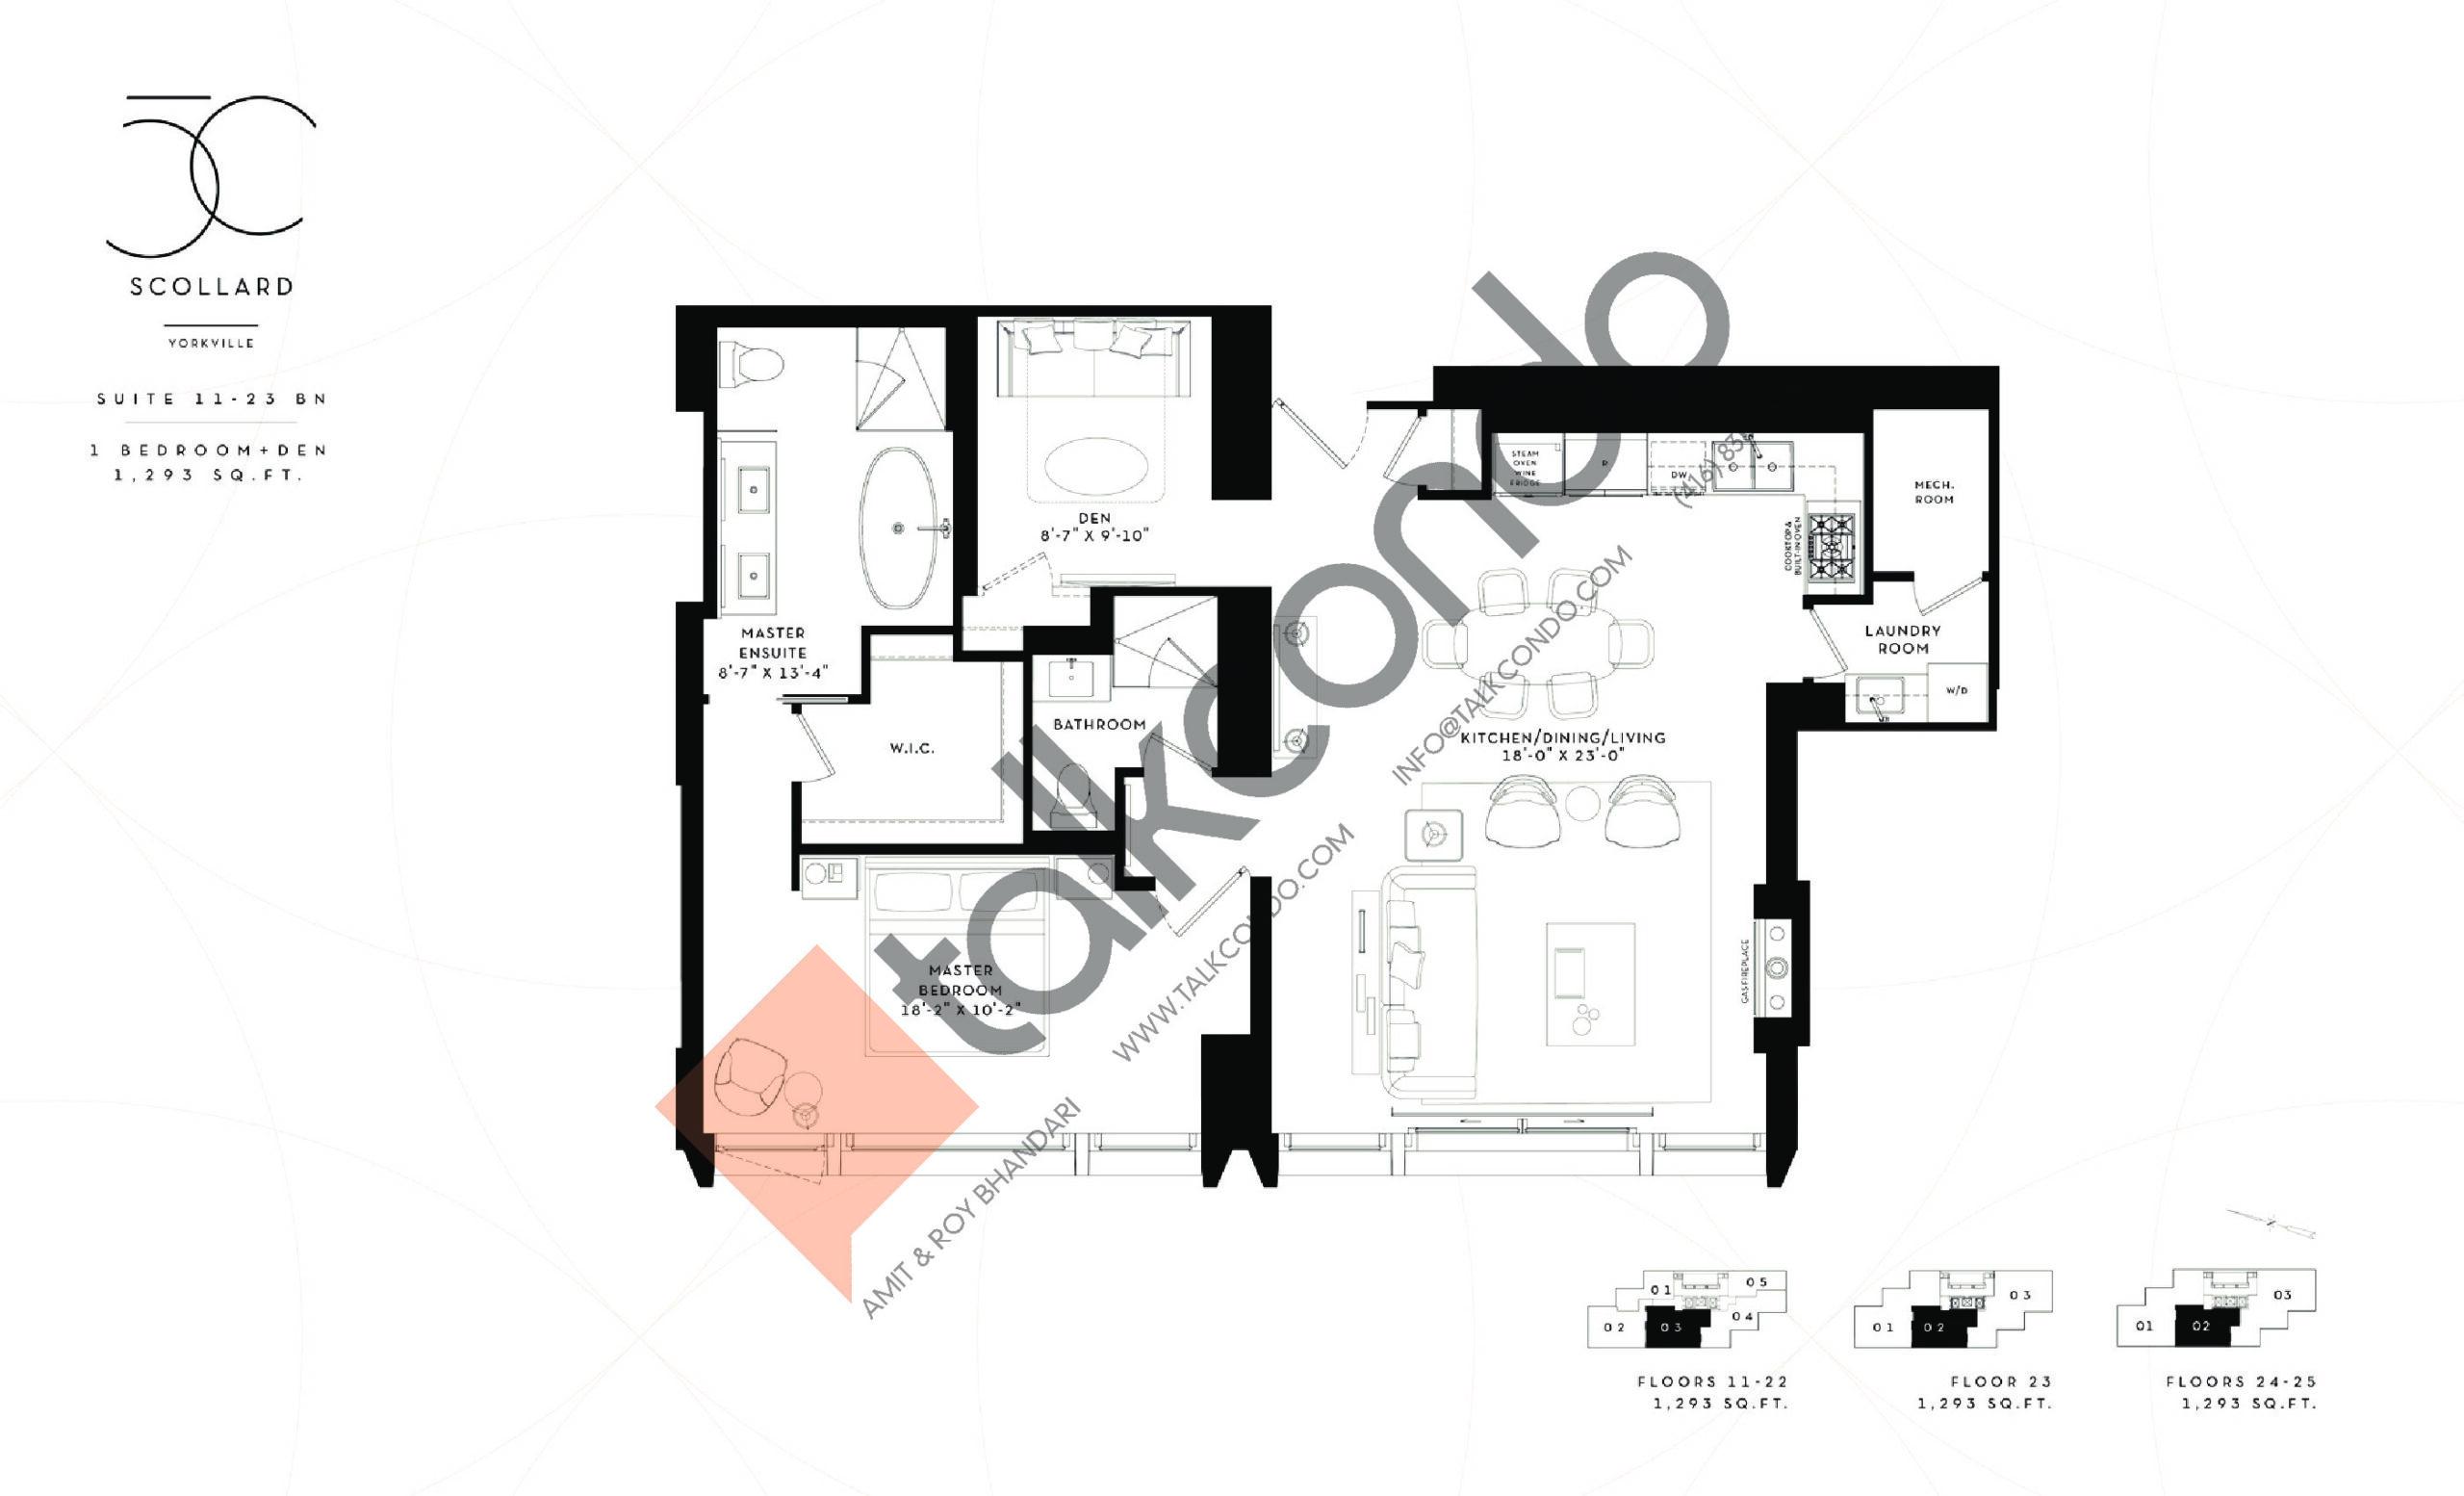 Suite 11-23 BN Floor Plan at Fifty Scollard Condos - 1293 sq.ft